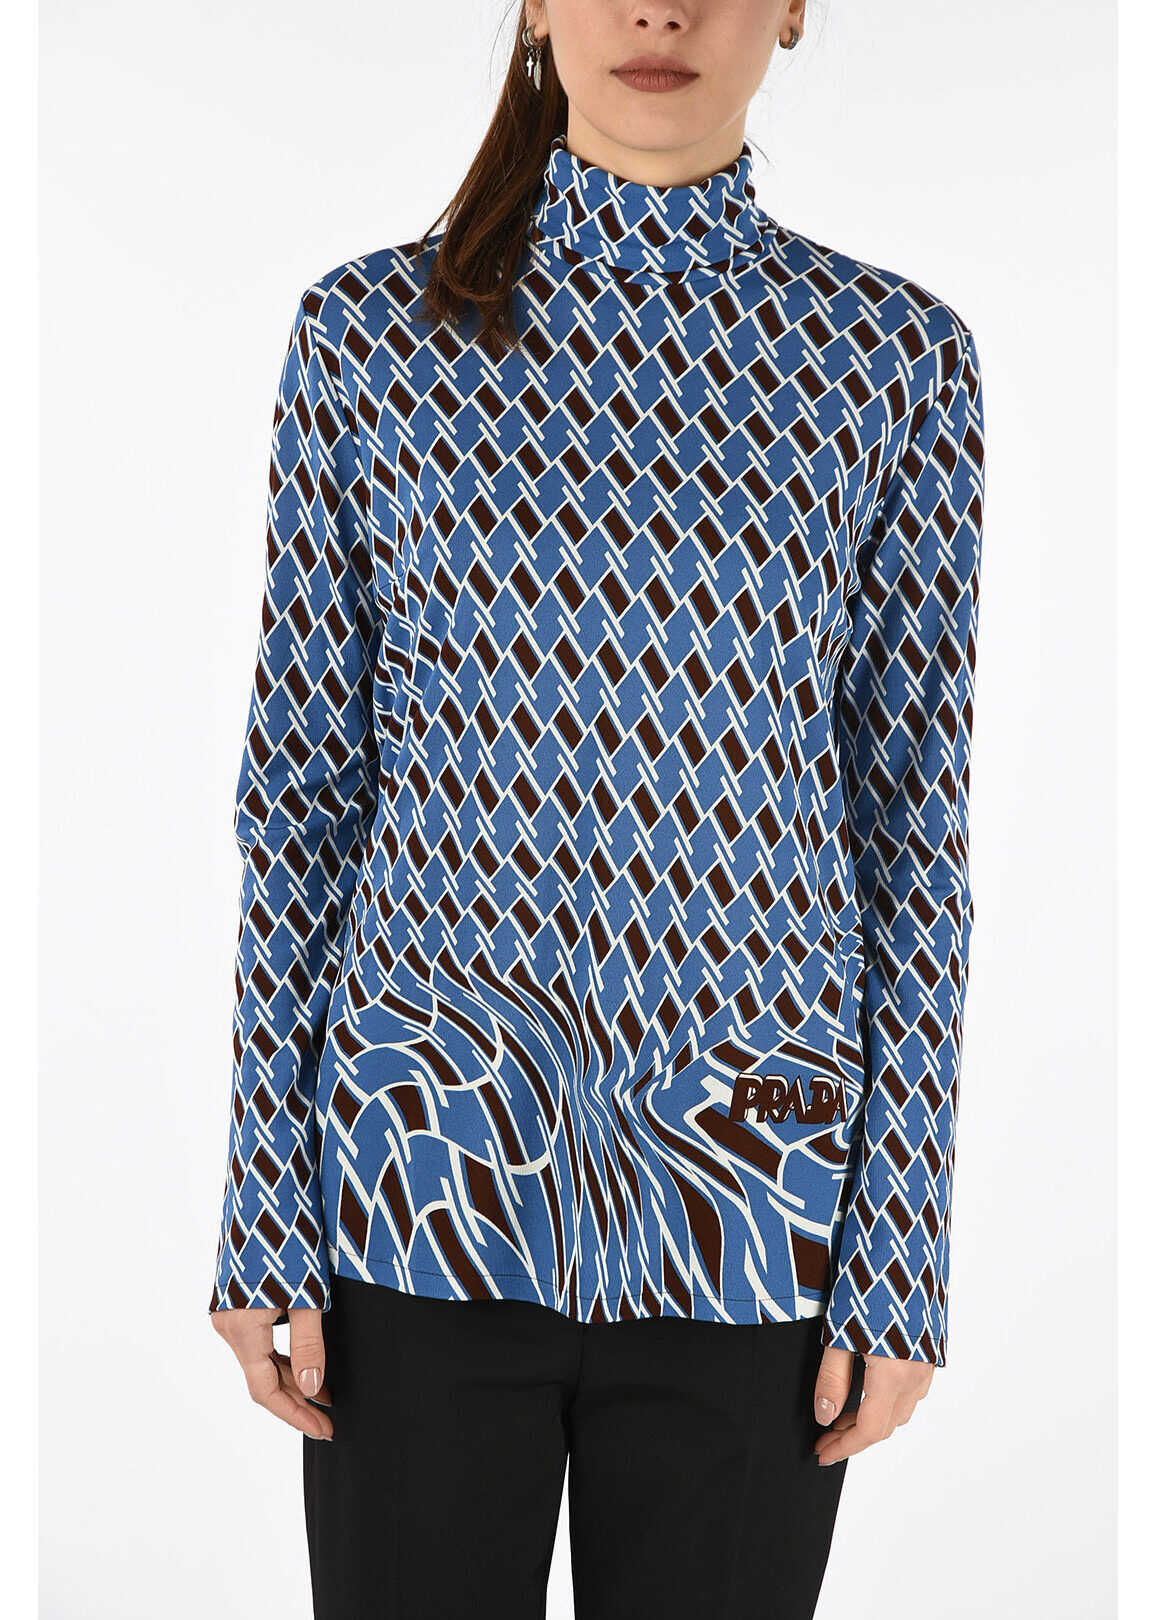 Prada printed turtle neck sweater BLUE